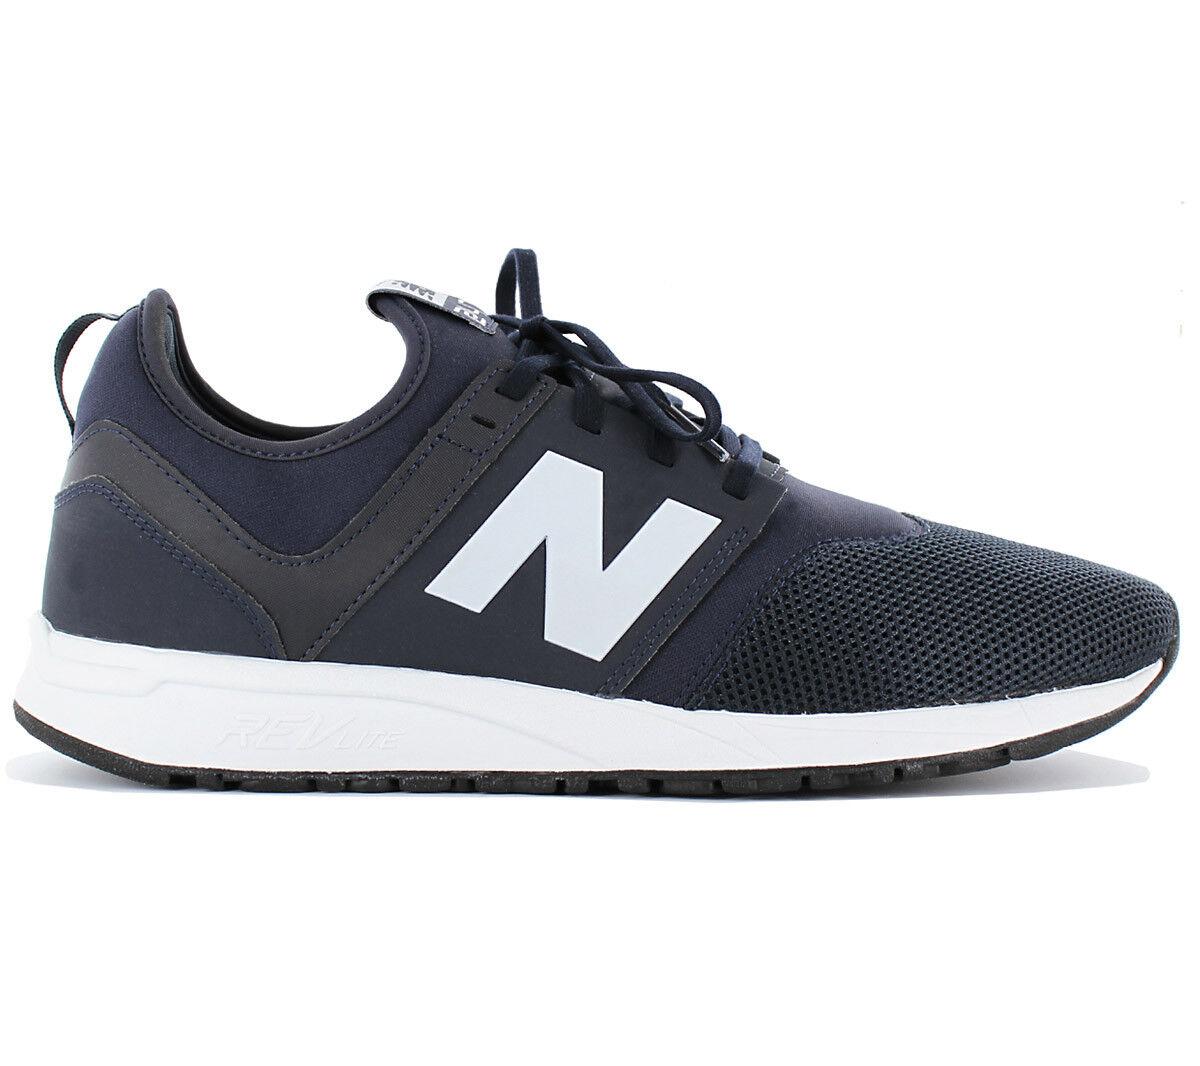 New Balance 247 REVlite Turnschuhe Navy-Blau Herren Schuhe Turnschuhe MRL247RB NEU